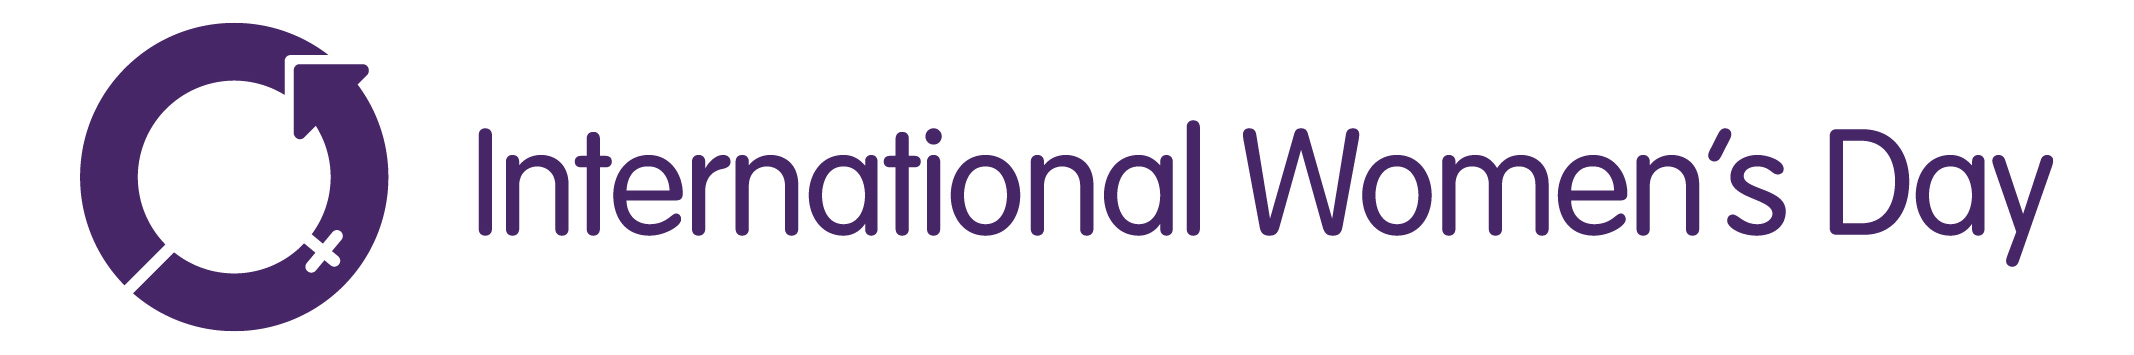 IWD logo cropped